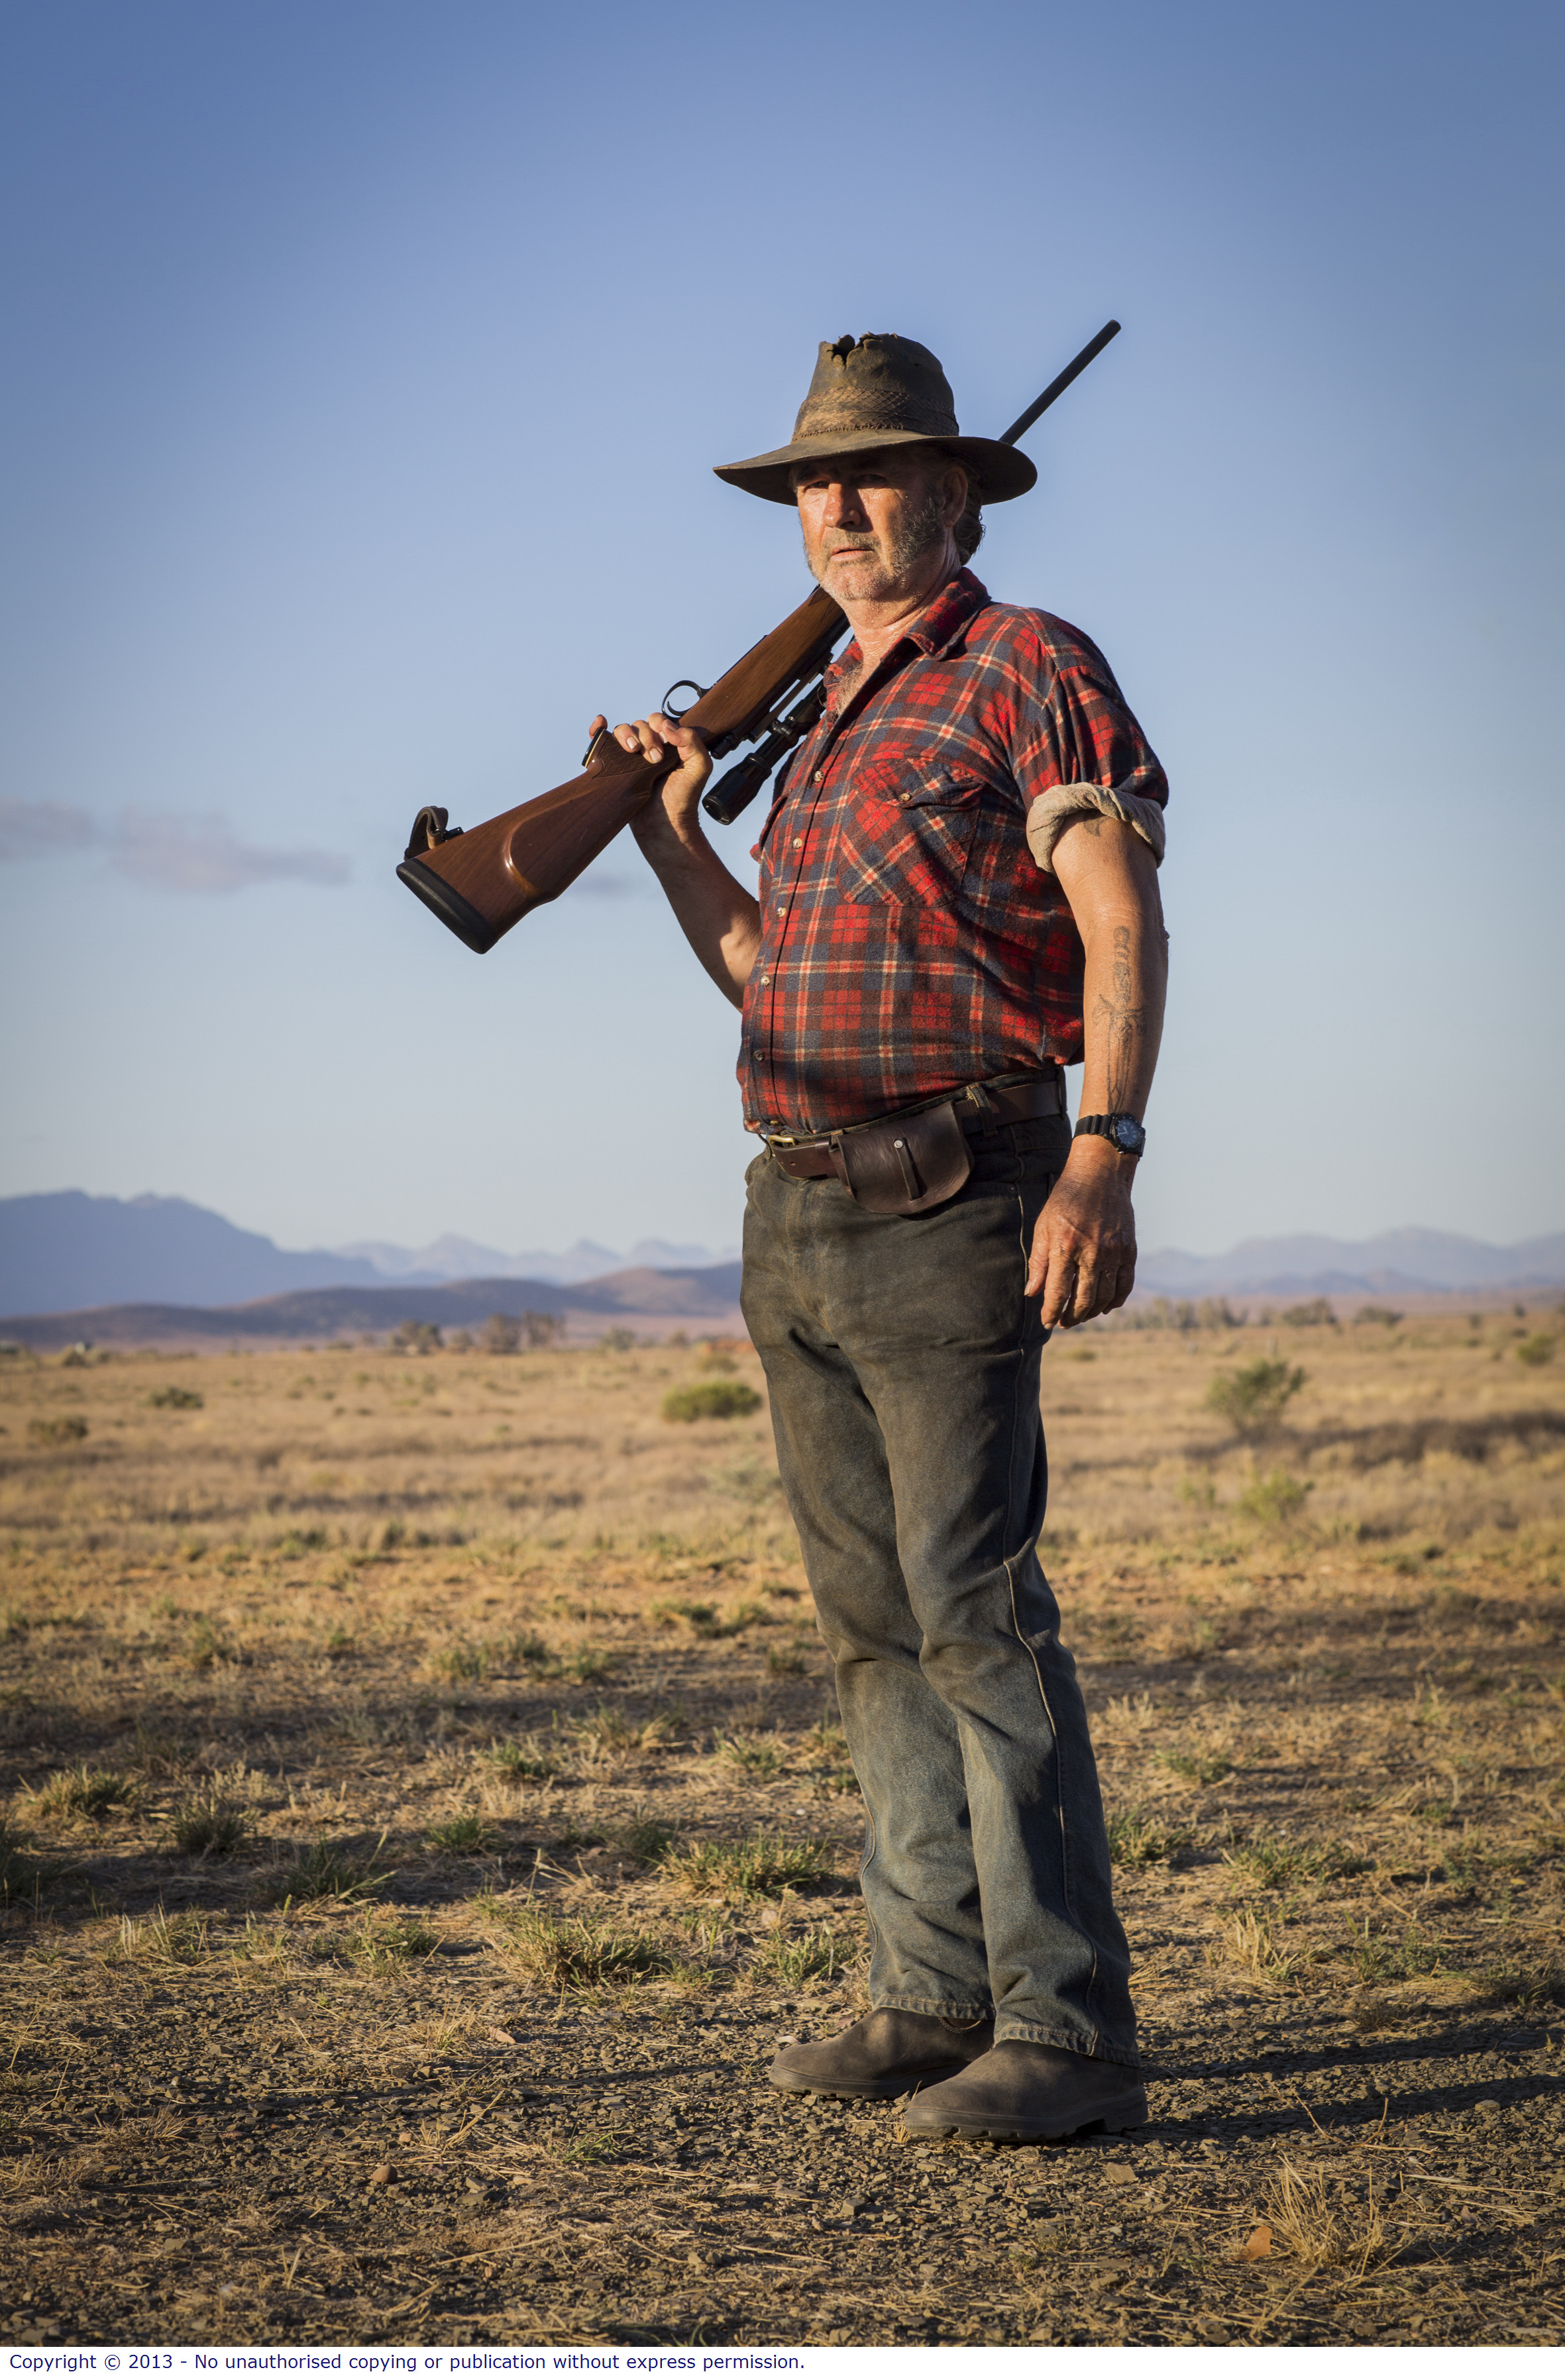 WolfCreek2_John Jarratt as Mick Taylor with gun 5